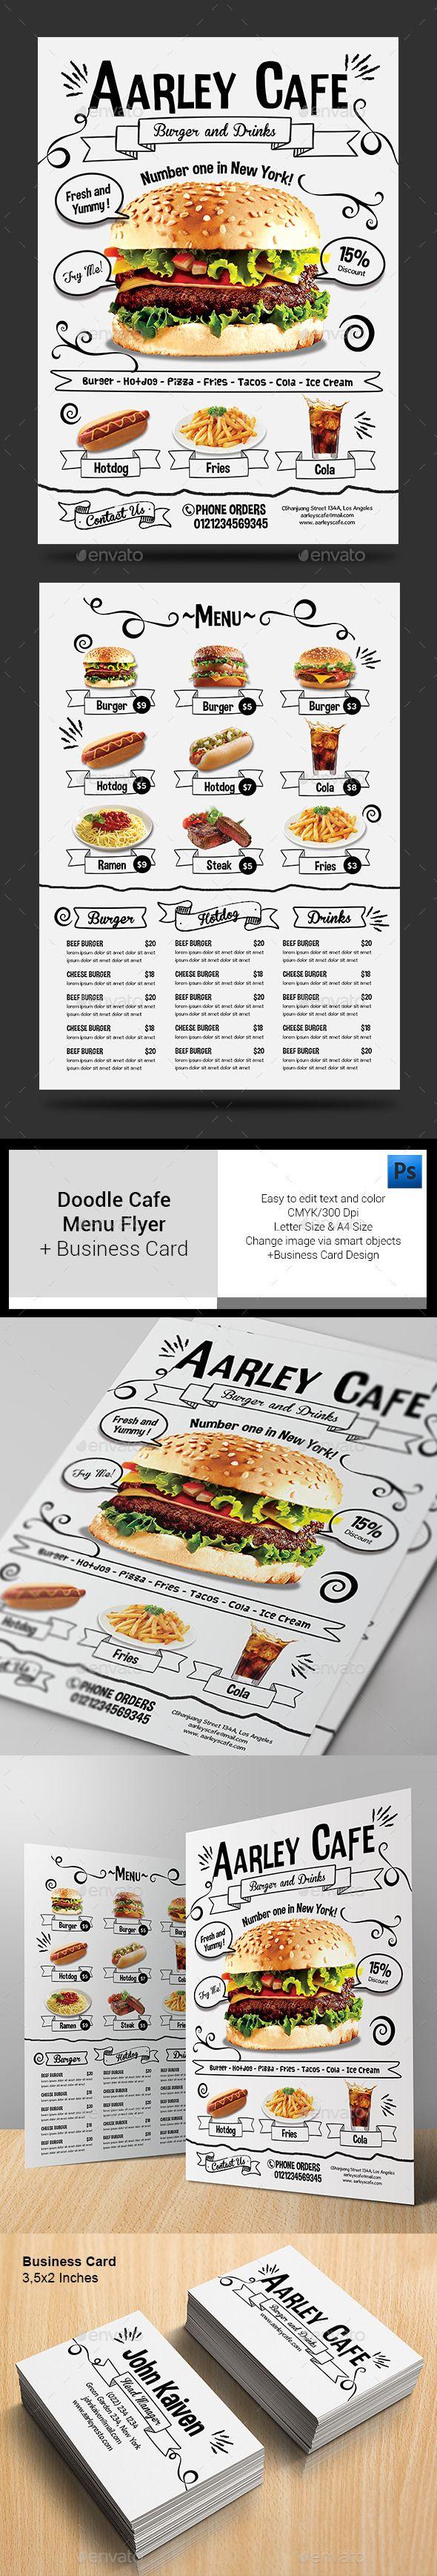 Doodle Cafe Menu + Business Card Template #design Download: http ...